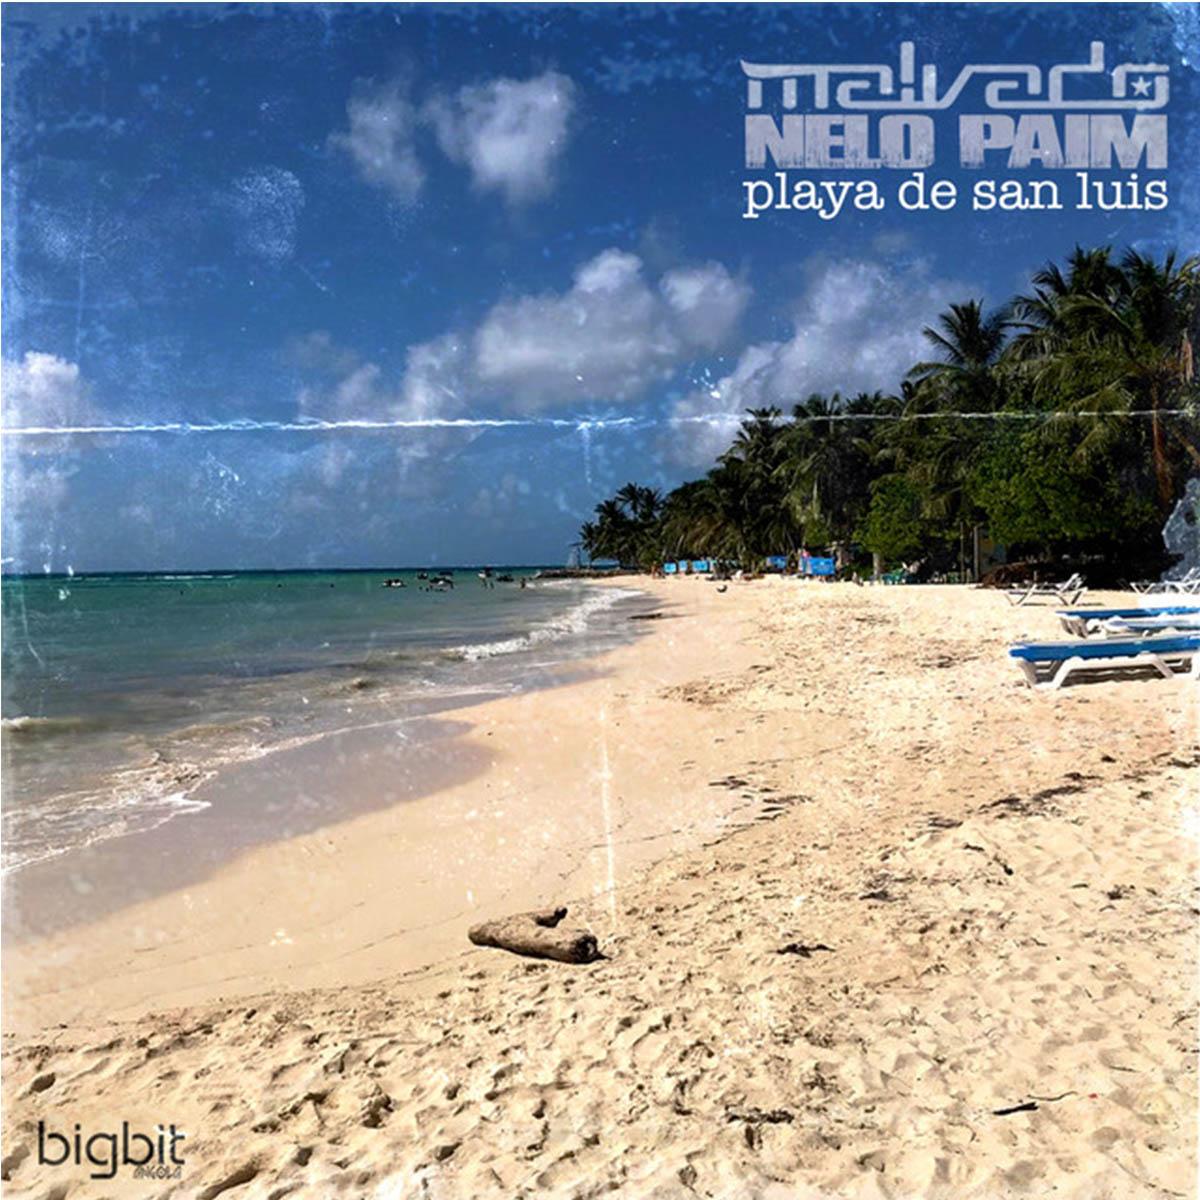 Dj Malvado & Nelo Paim – Playa de San Luis (Remix)